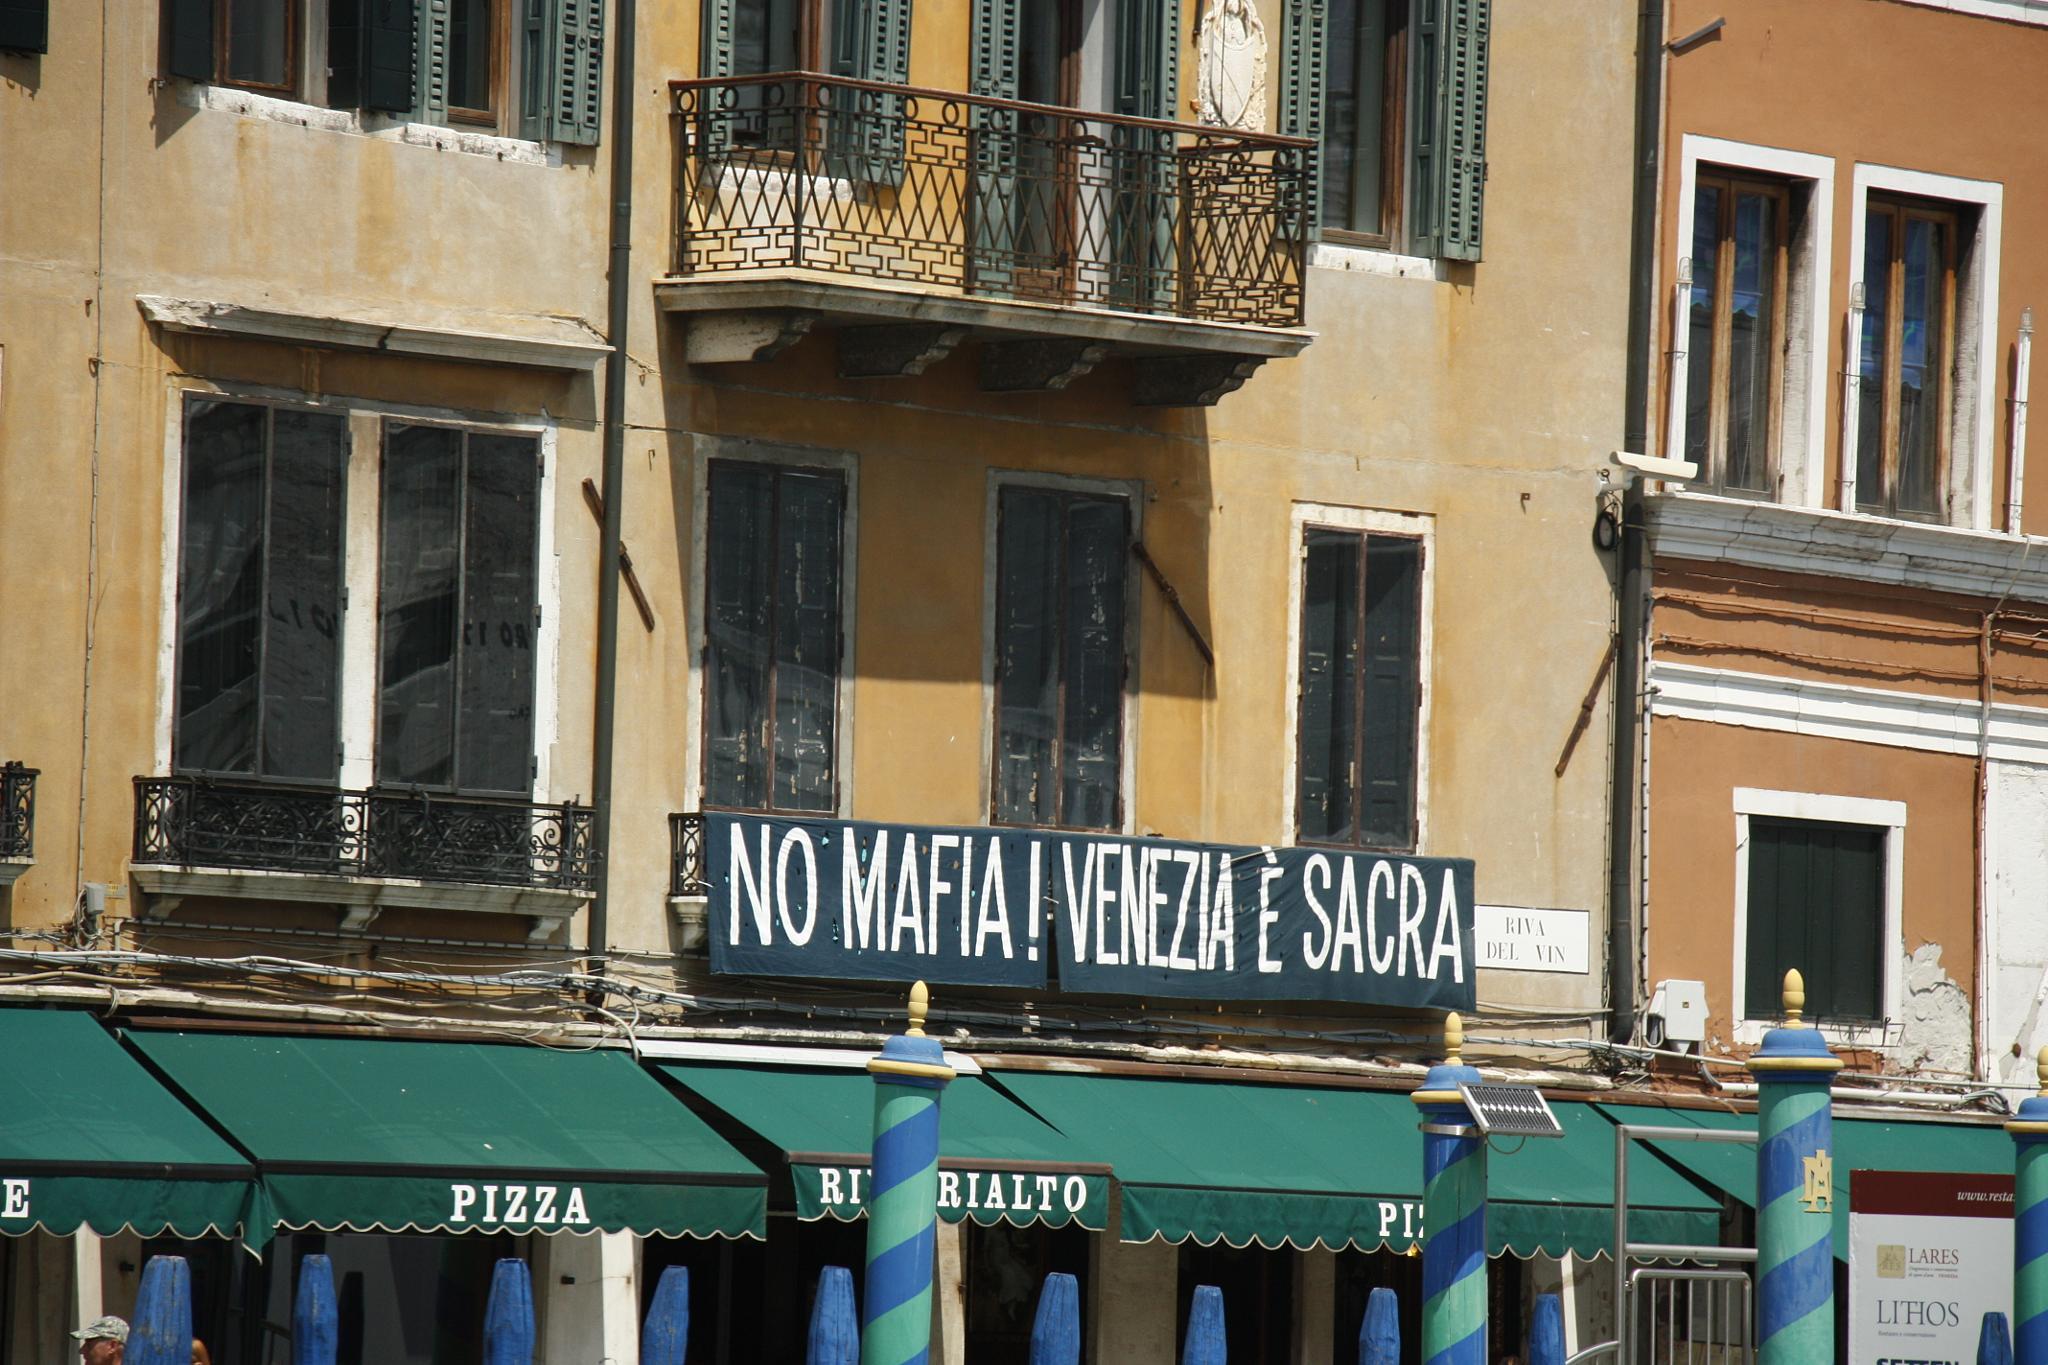 ITALIA, VENEZIA ...NO MAFIA... ... ... by Paulus5301